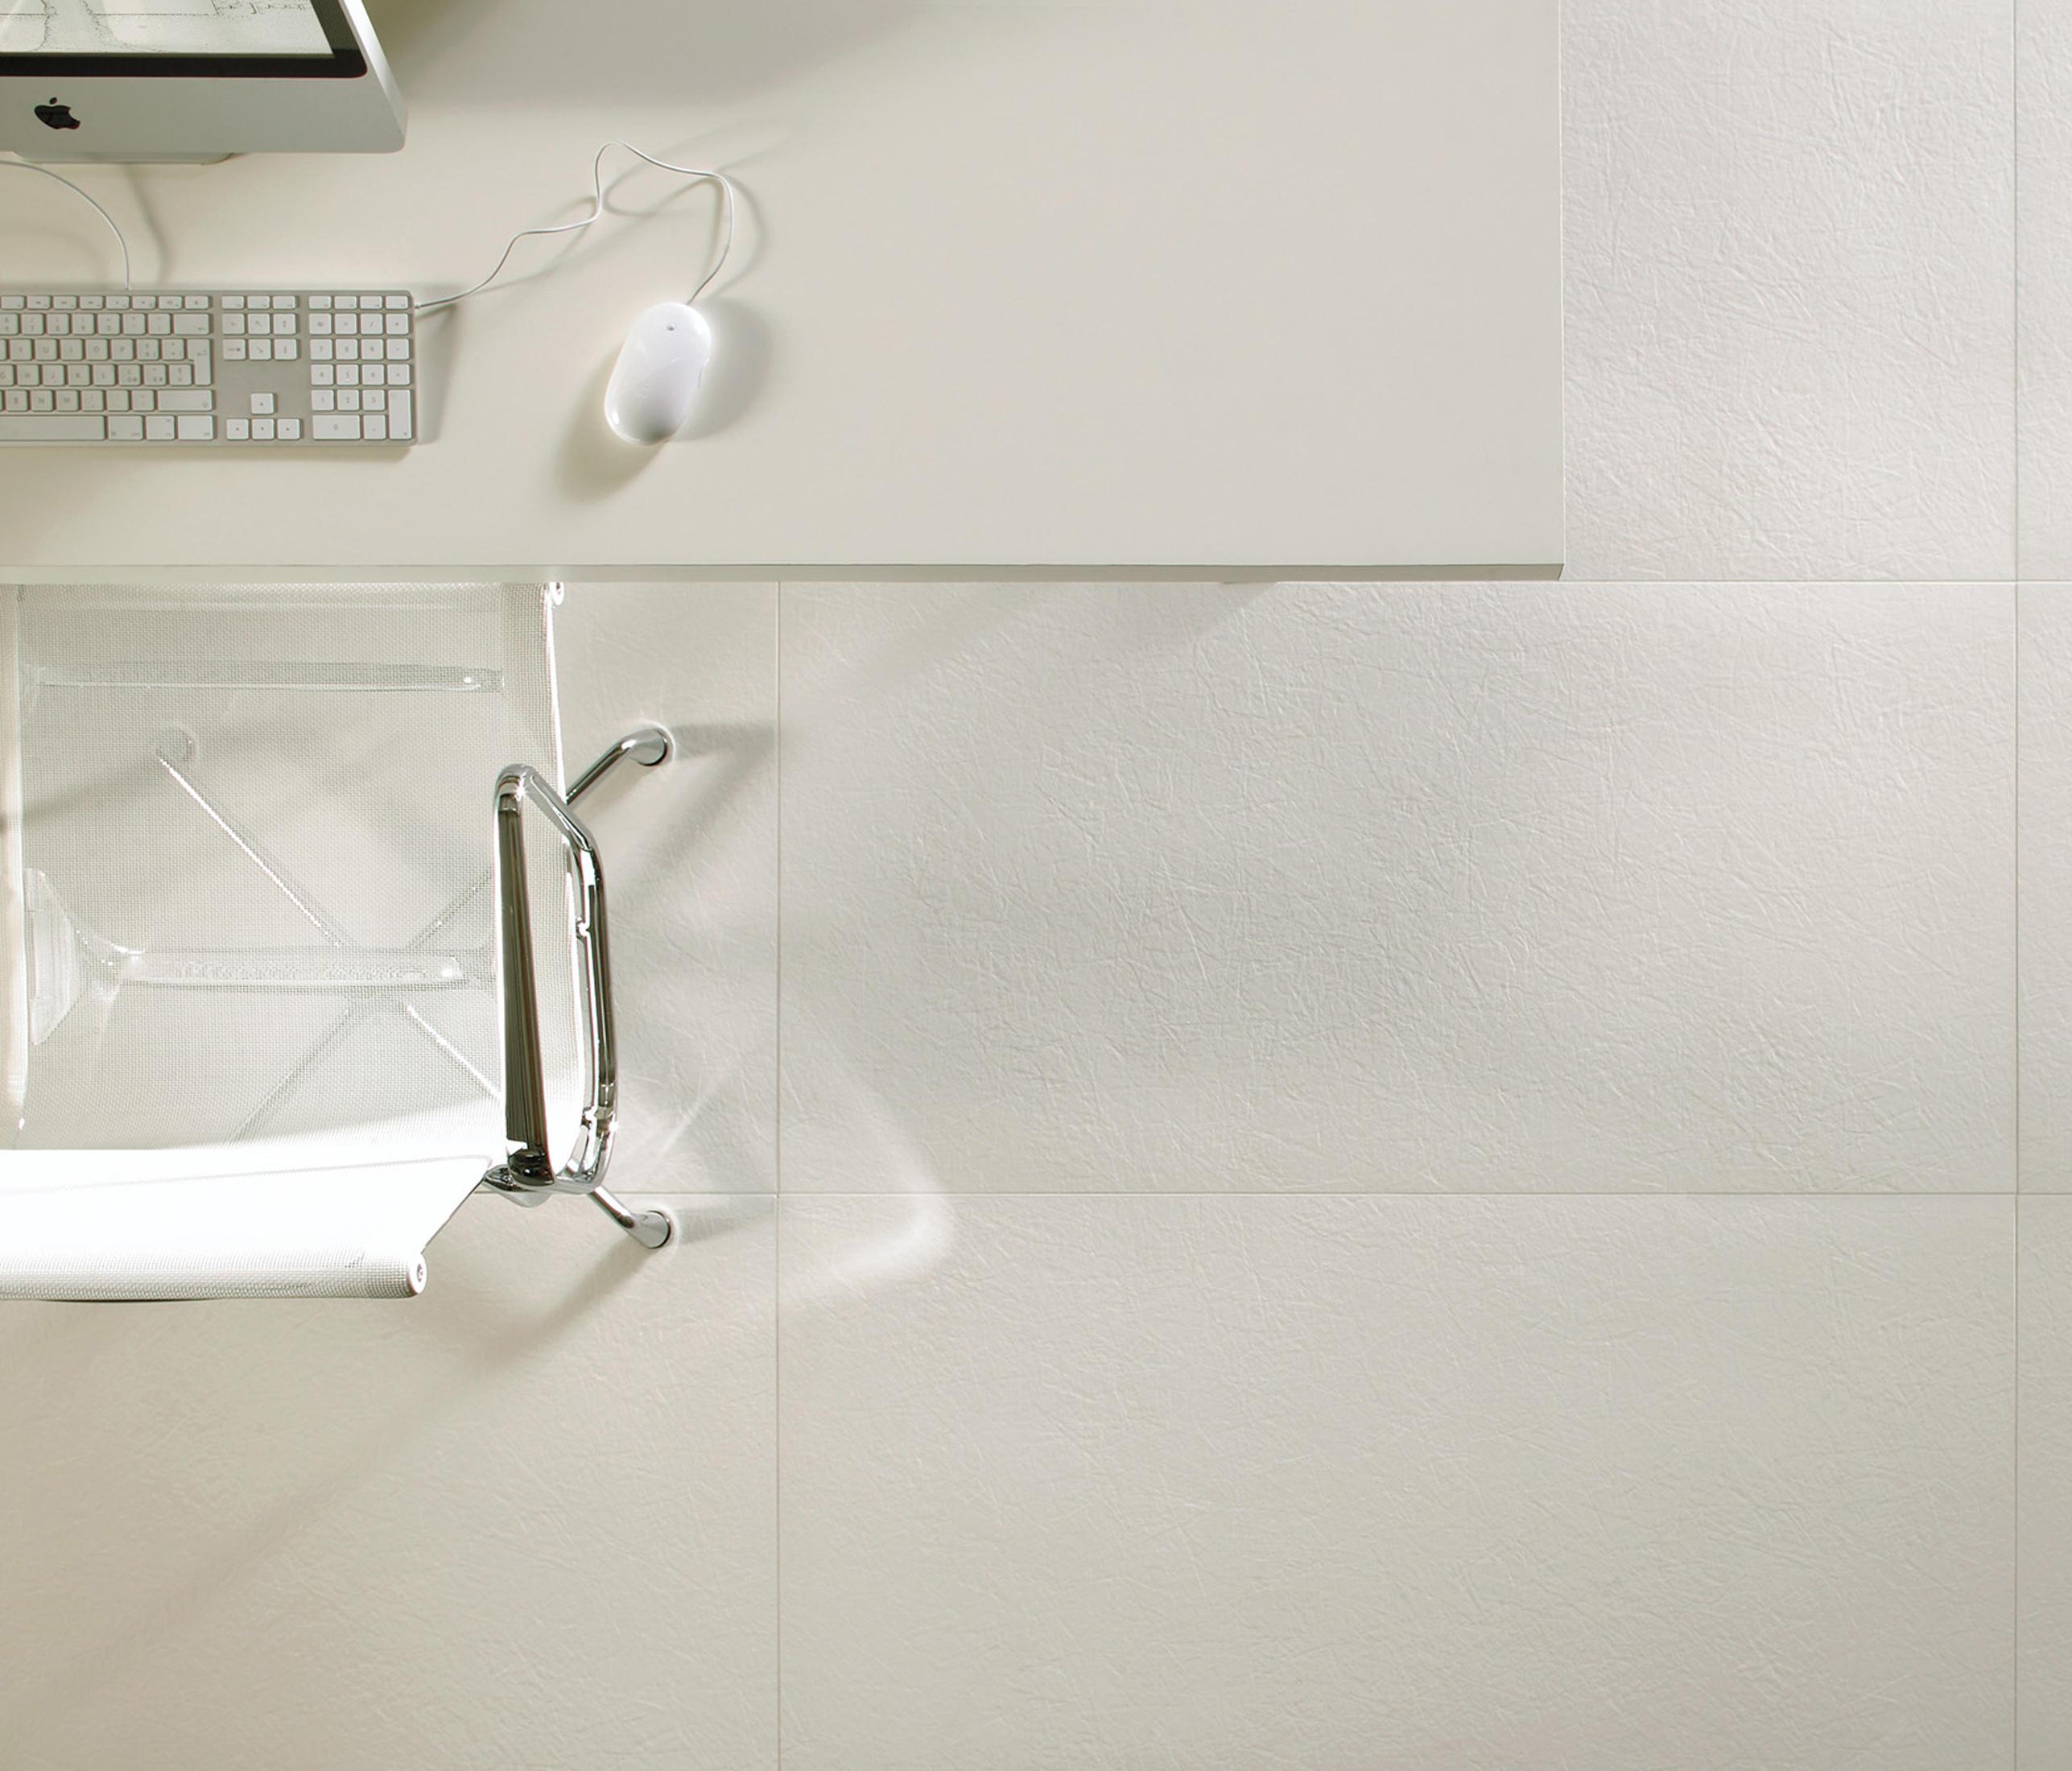 LESS BLACK CARTA RISO Floor tiles from Floor Gres by Florim